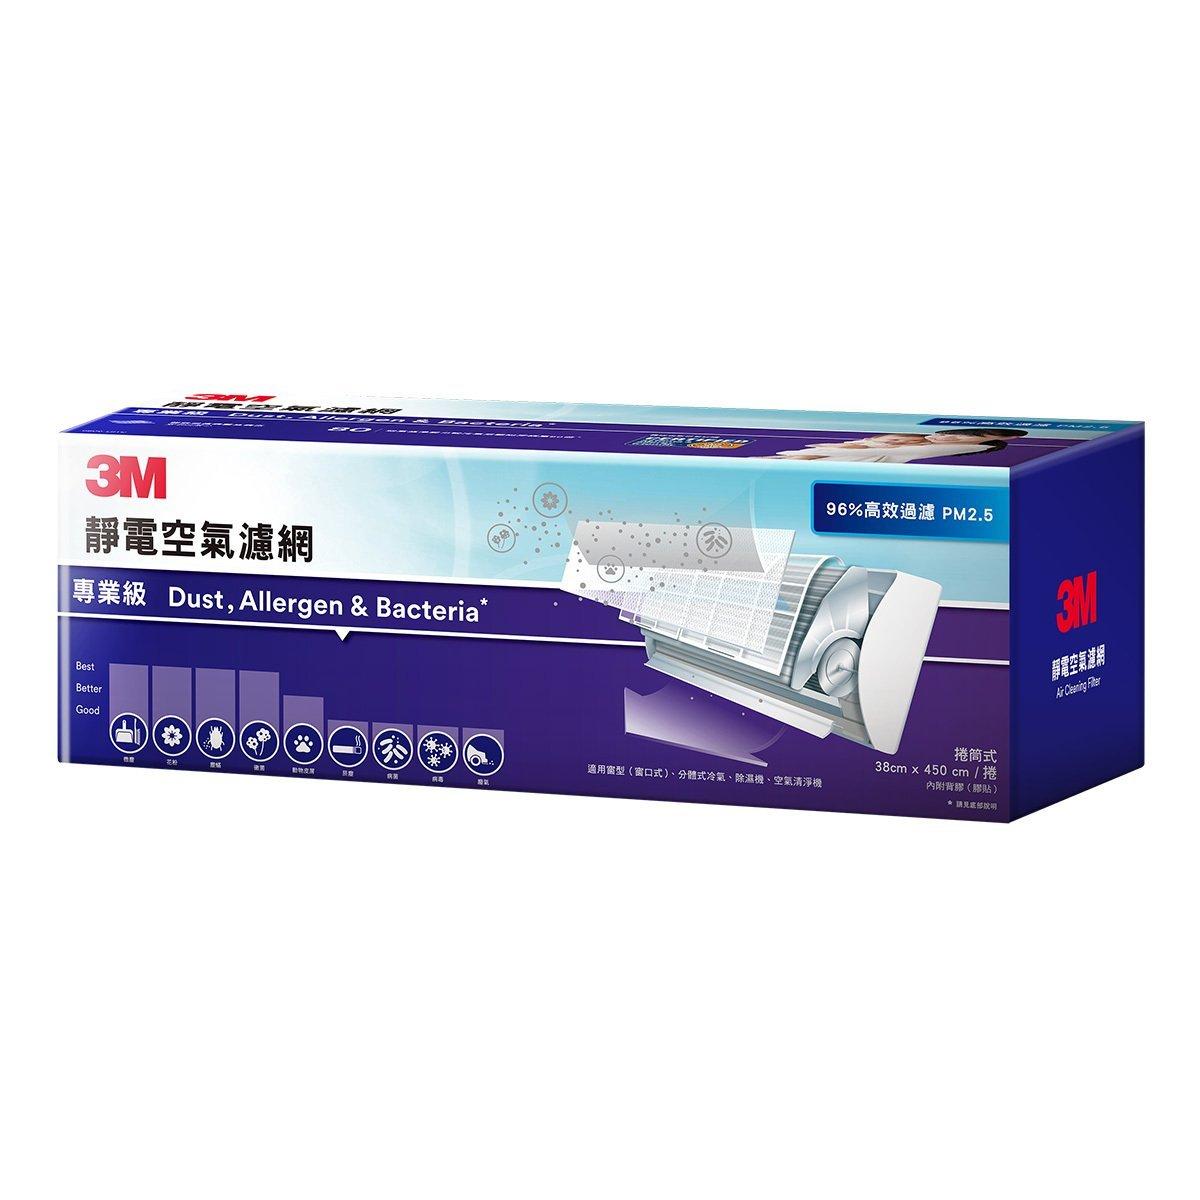 costco代購 #126030 3M 專業級空氣靜電濾網 38X450公分*